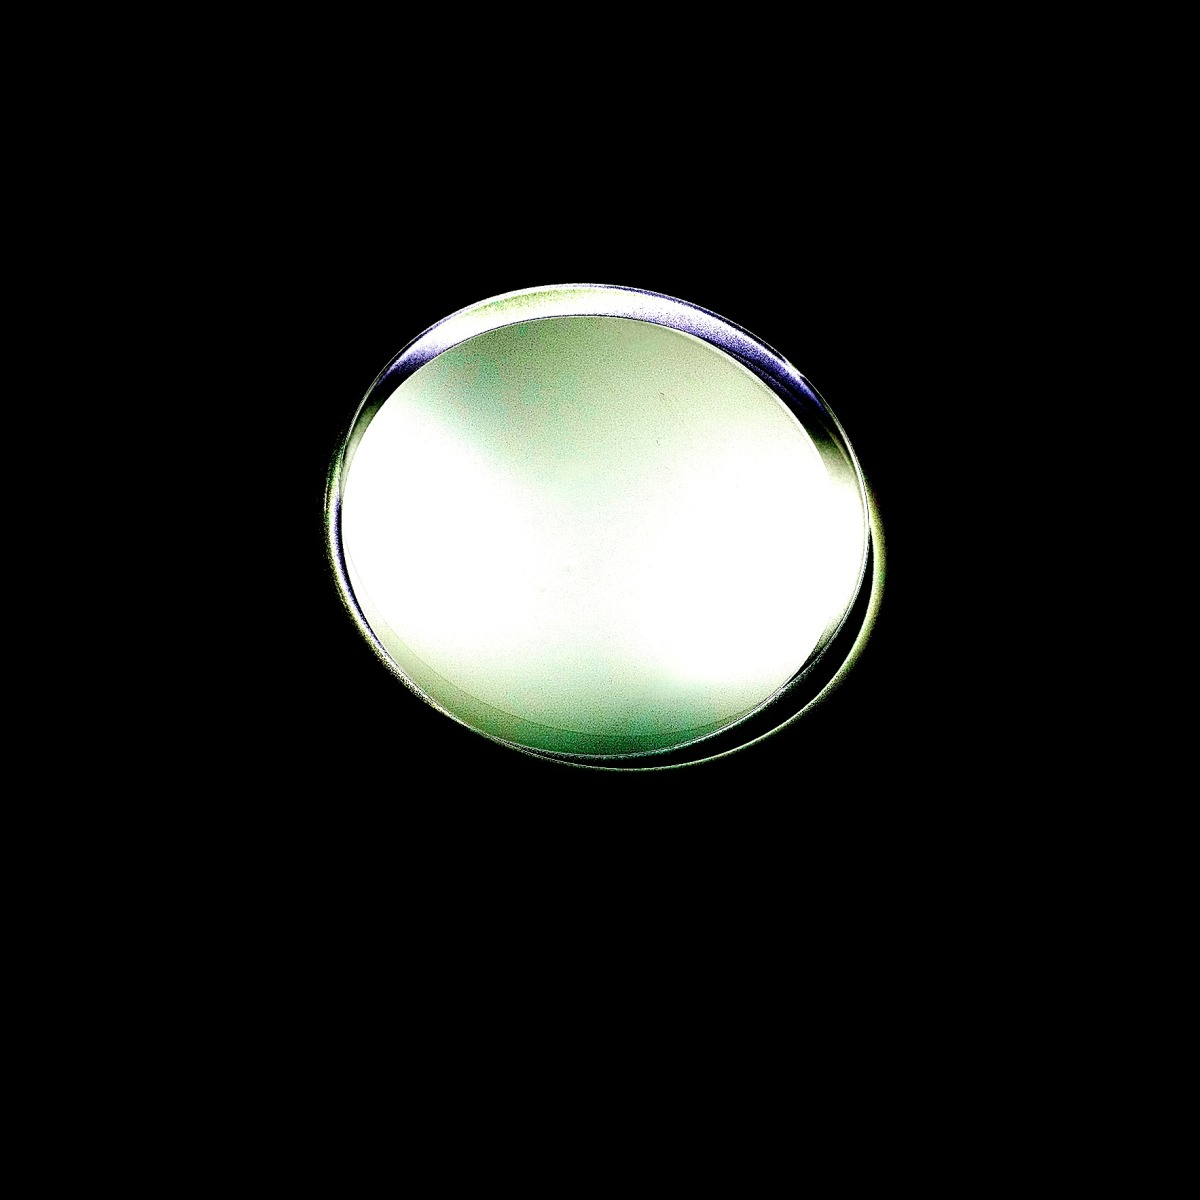 lampshade 9.17 upload 2.jpg